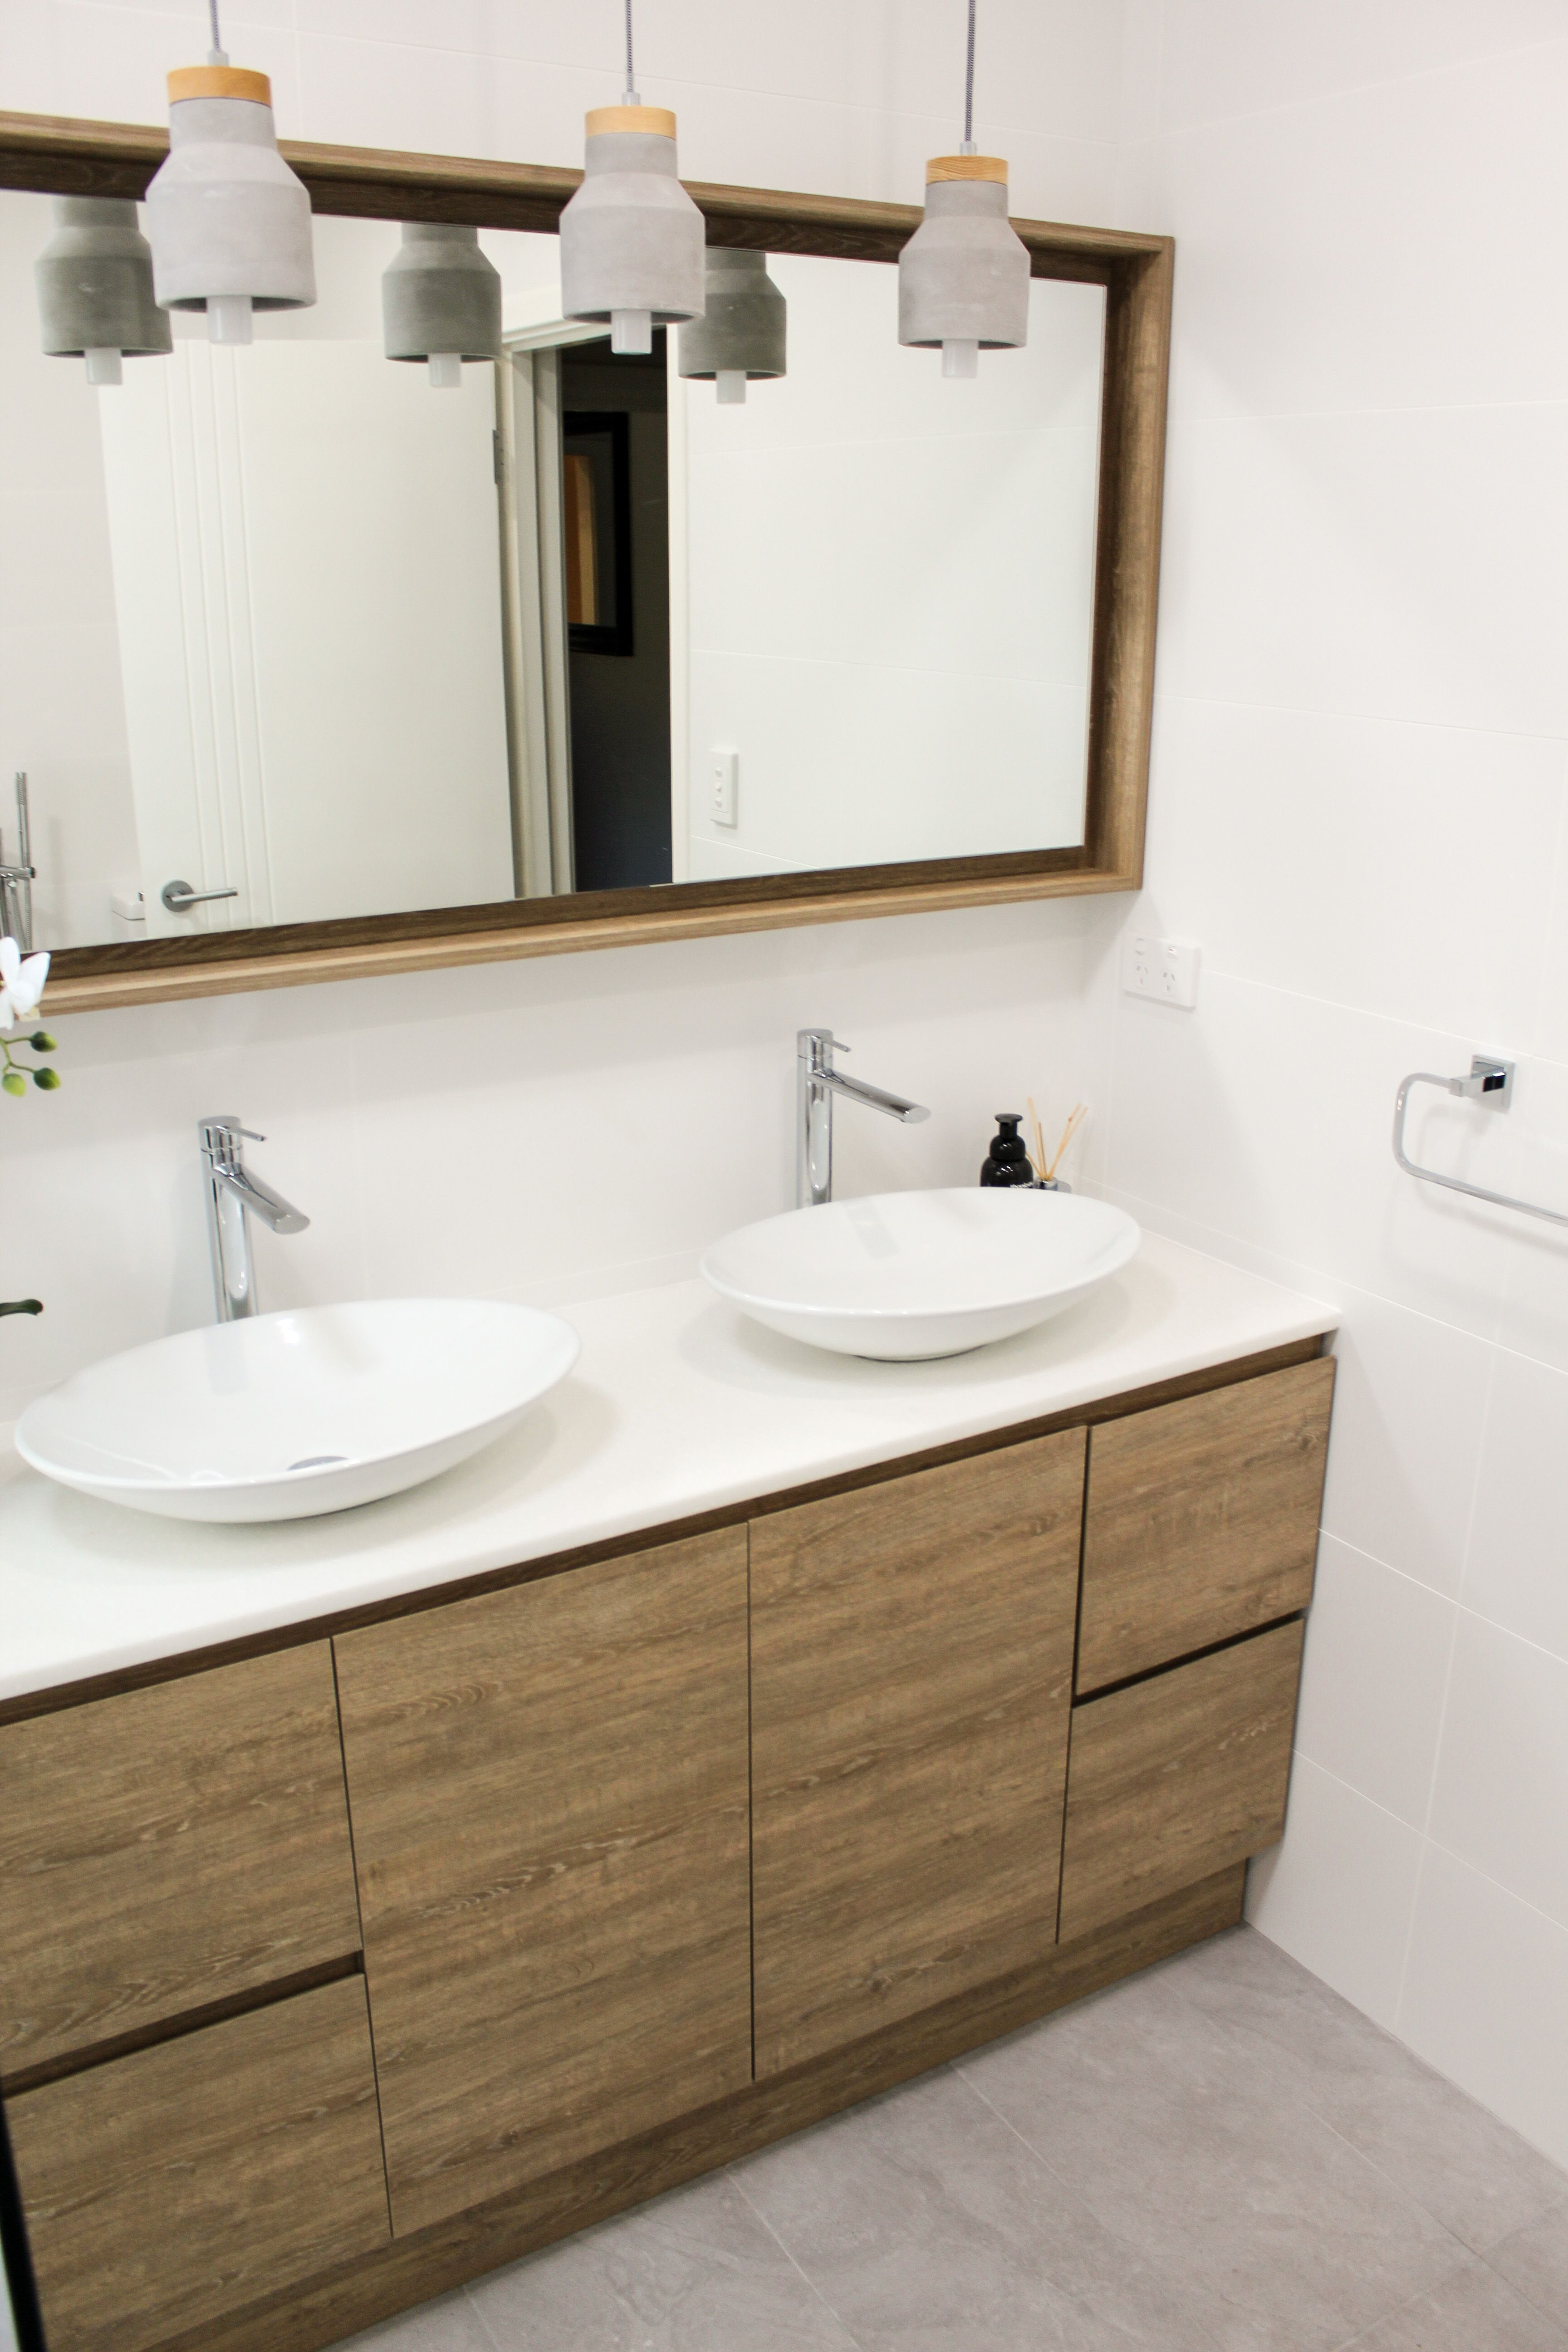 Wood Grain Vanity - Wood Vanity and Mirror Combo - Double Vanity ...